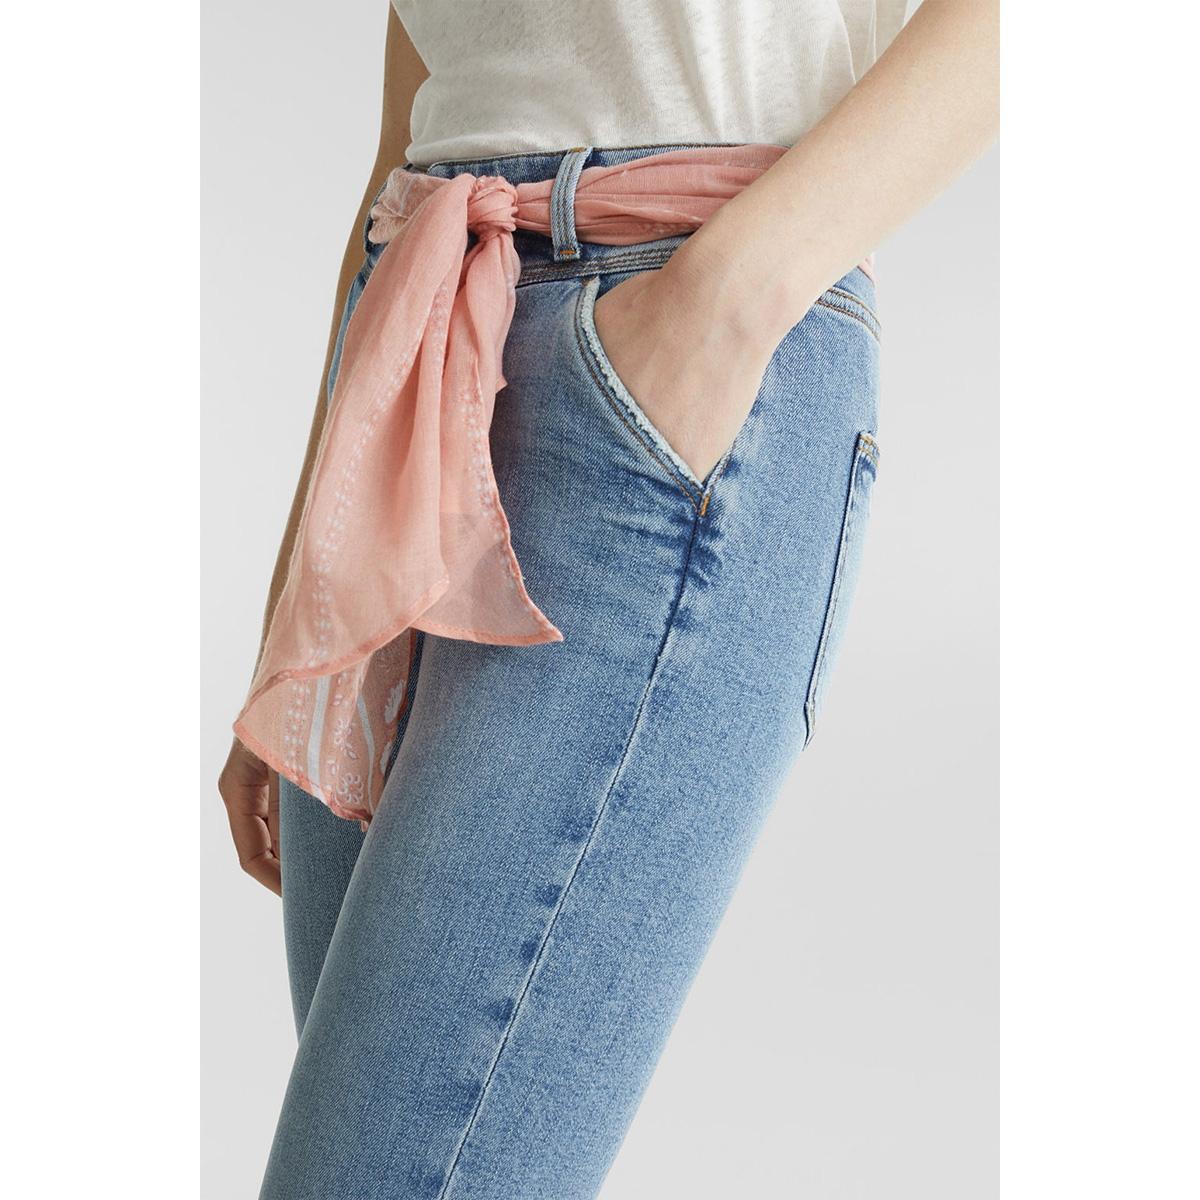 enkellange jeans met bandana 040ee1b313 esprit jeans e902